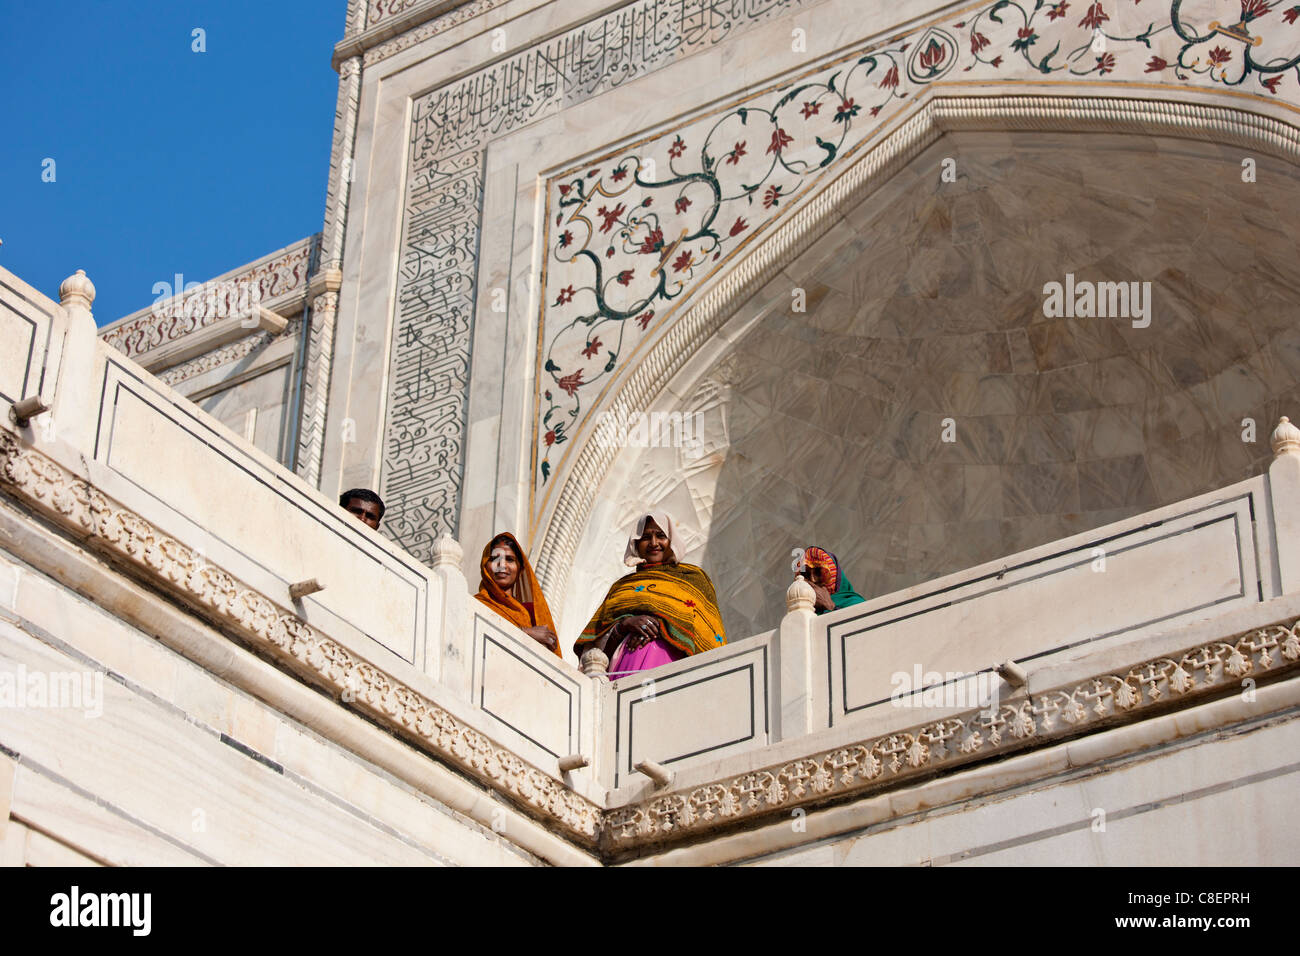 Indian tourists at The Taj Mahal mausoleum, Uttar Pradesh, India - Stock Image